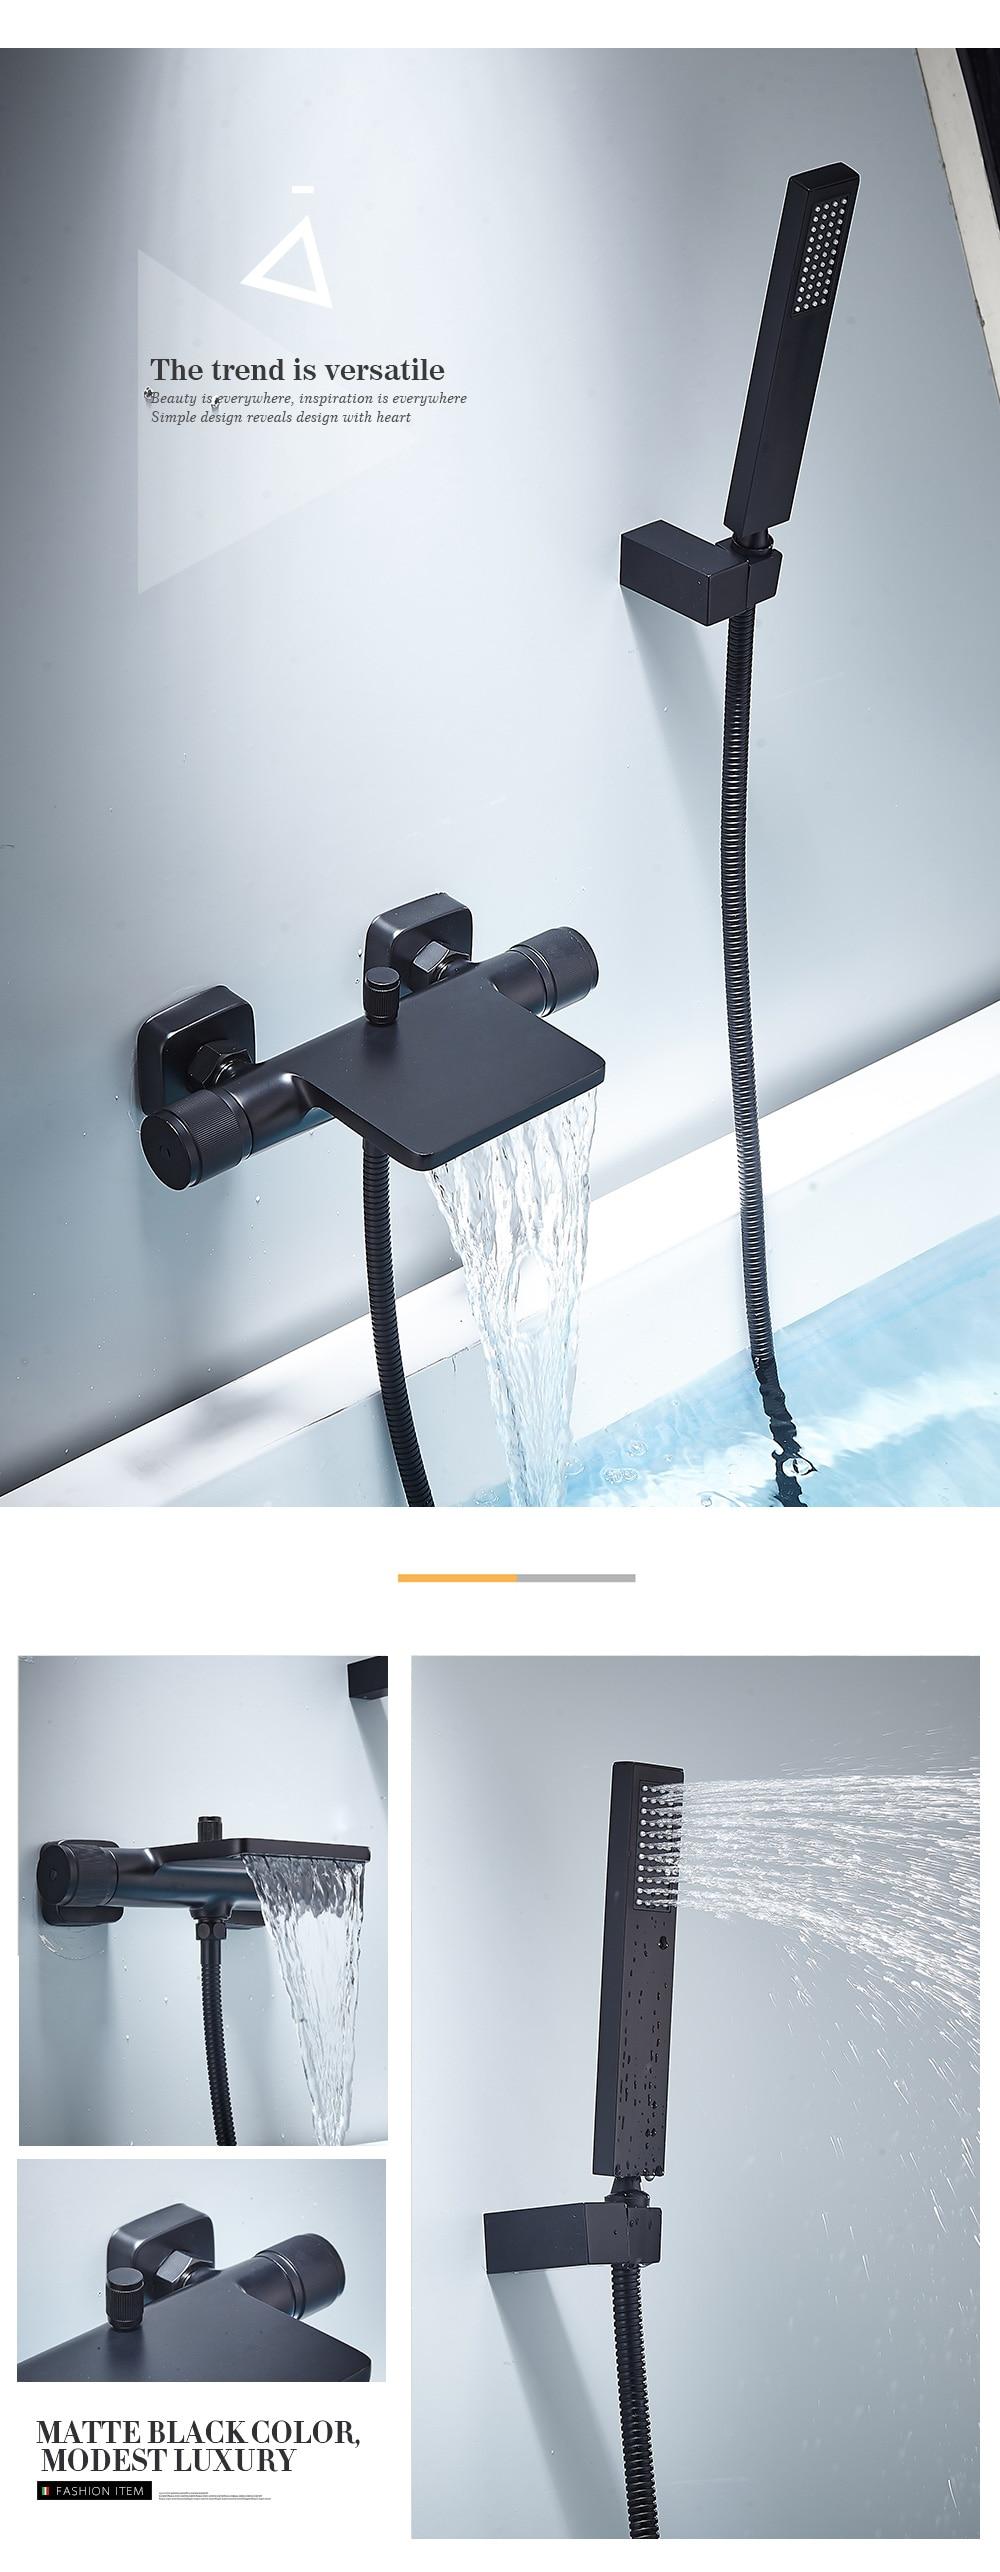 Hdc6bbf7da6d24e5e916ceb2b8a58765aa Bathtub Shower Faucet Mixer Solid Brass Black Wall Mount Shower Faucet With Hand Shower Bathroom Waterfall Bathub Faucet WB1620